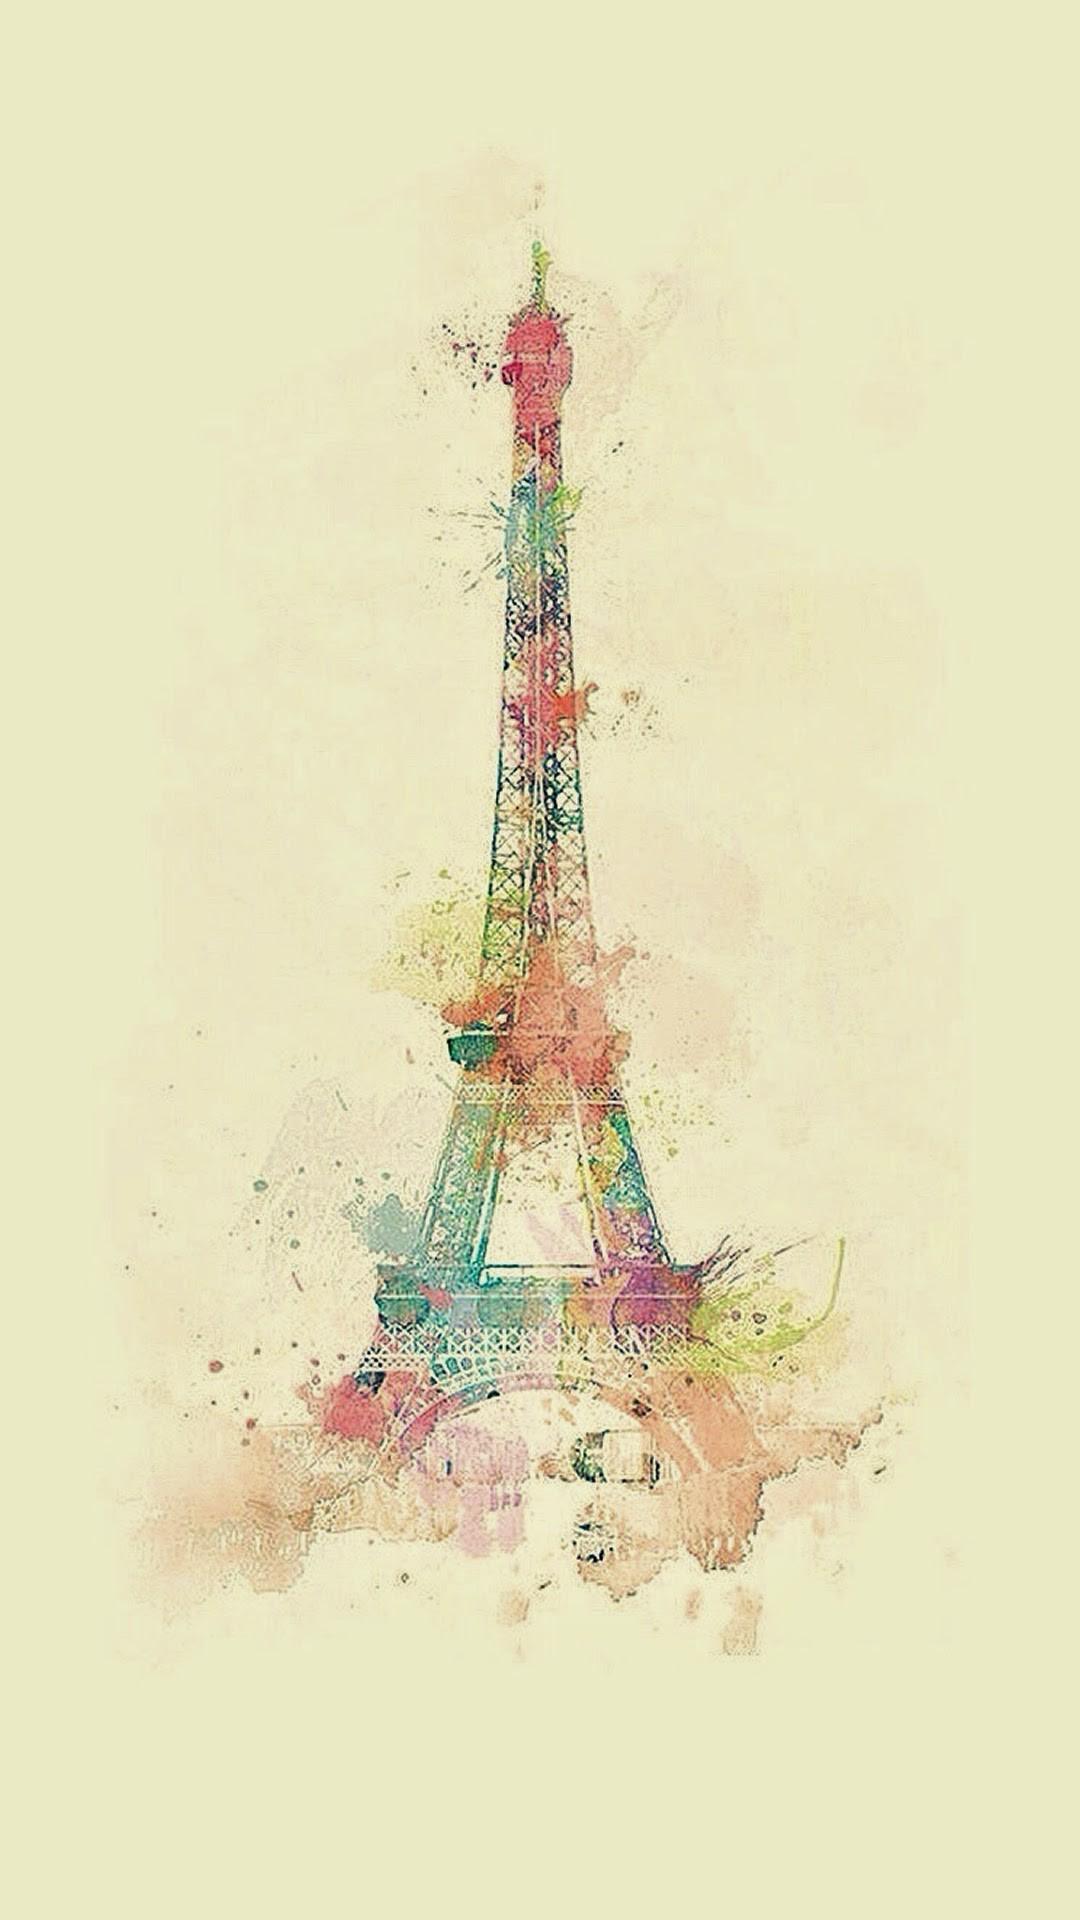 Best Wallpaper Harry Potter Watercolor - 631380-parisian-wallpaper-1080x1920-hd  Picture_52151.jpg